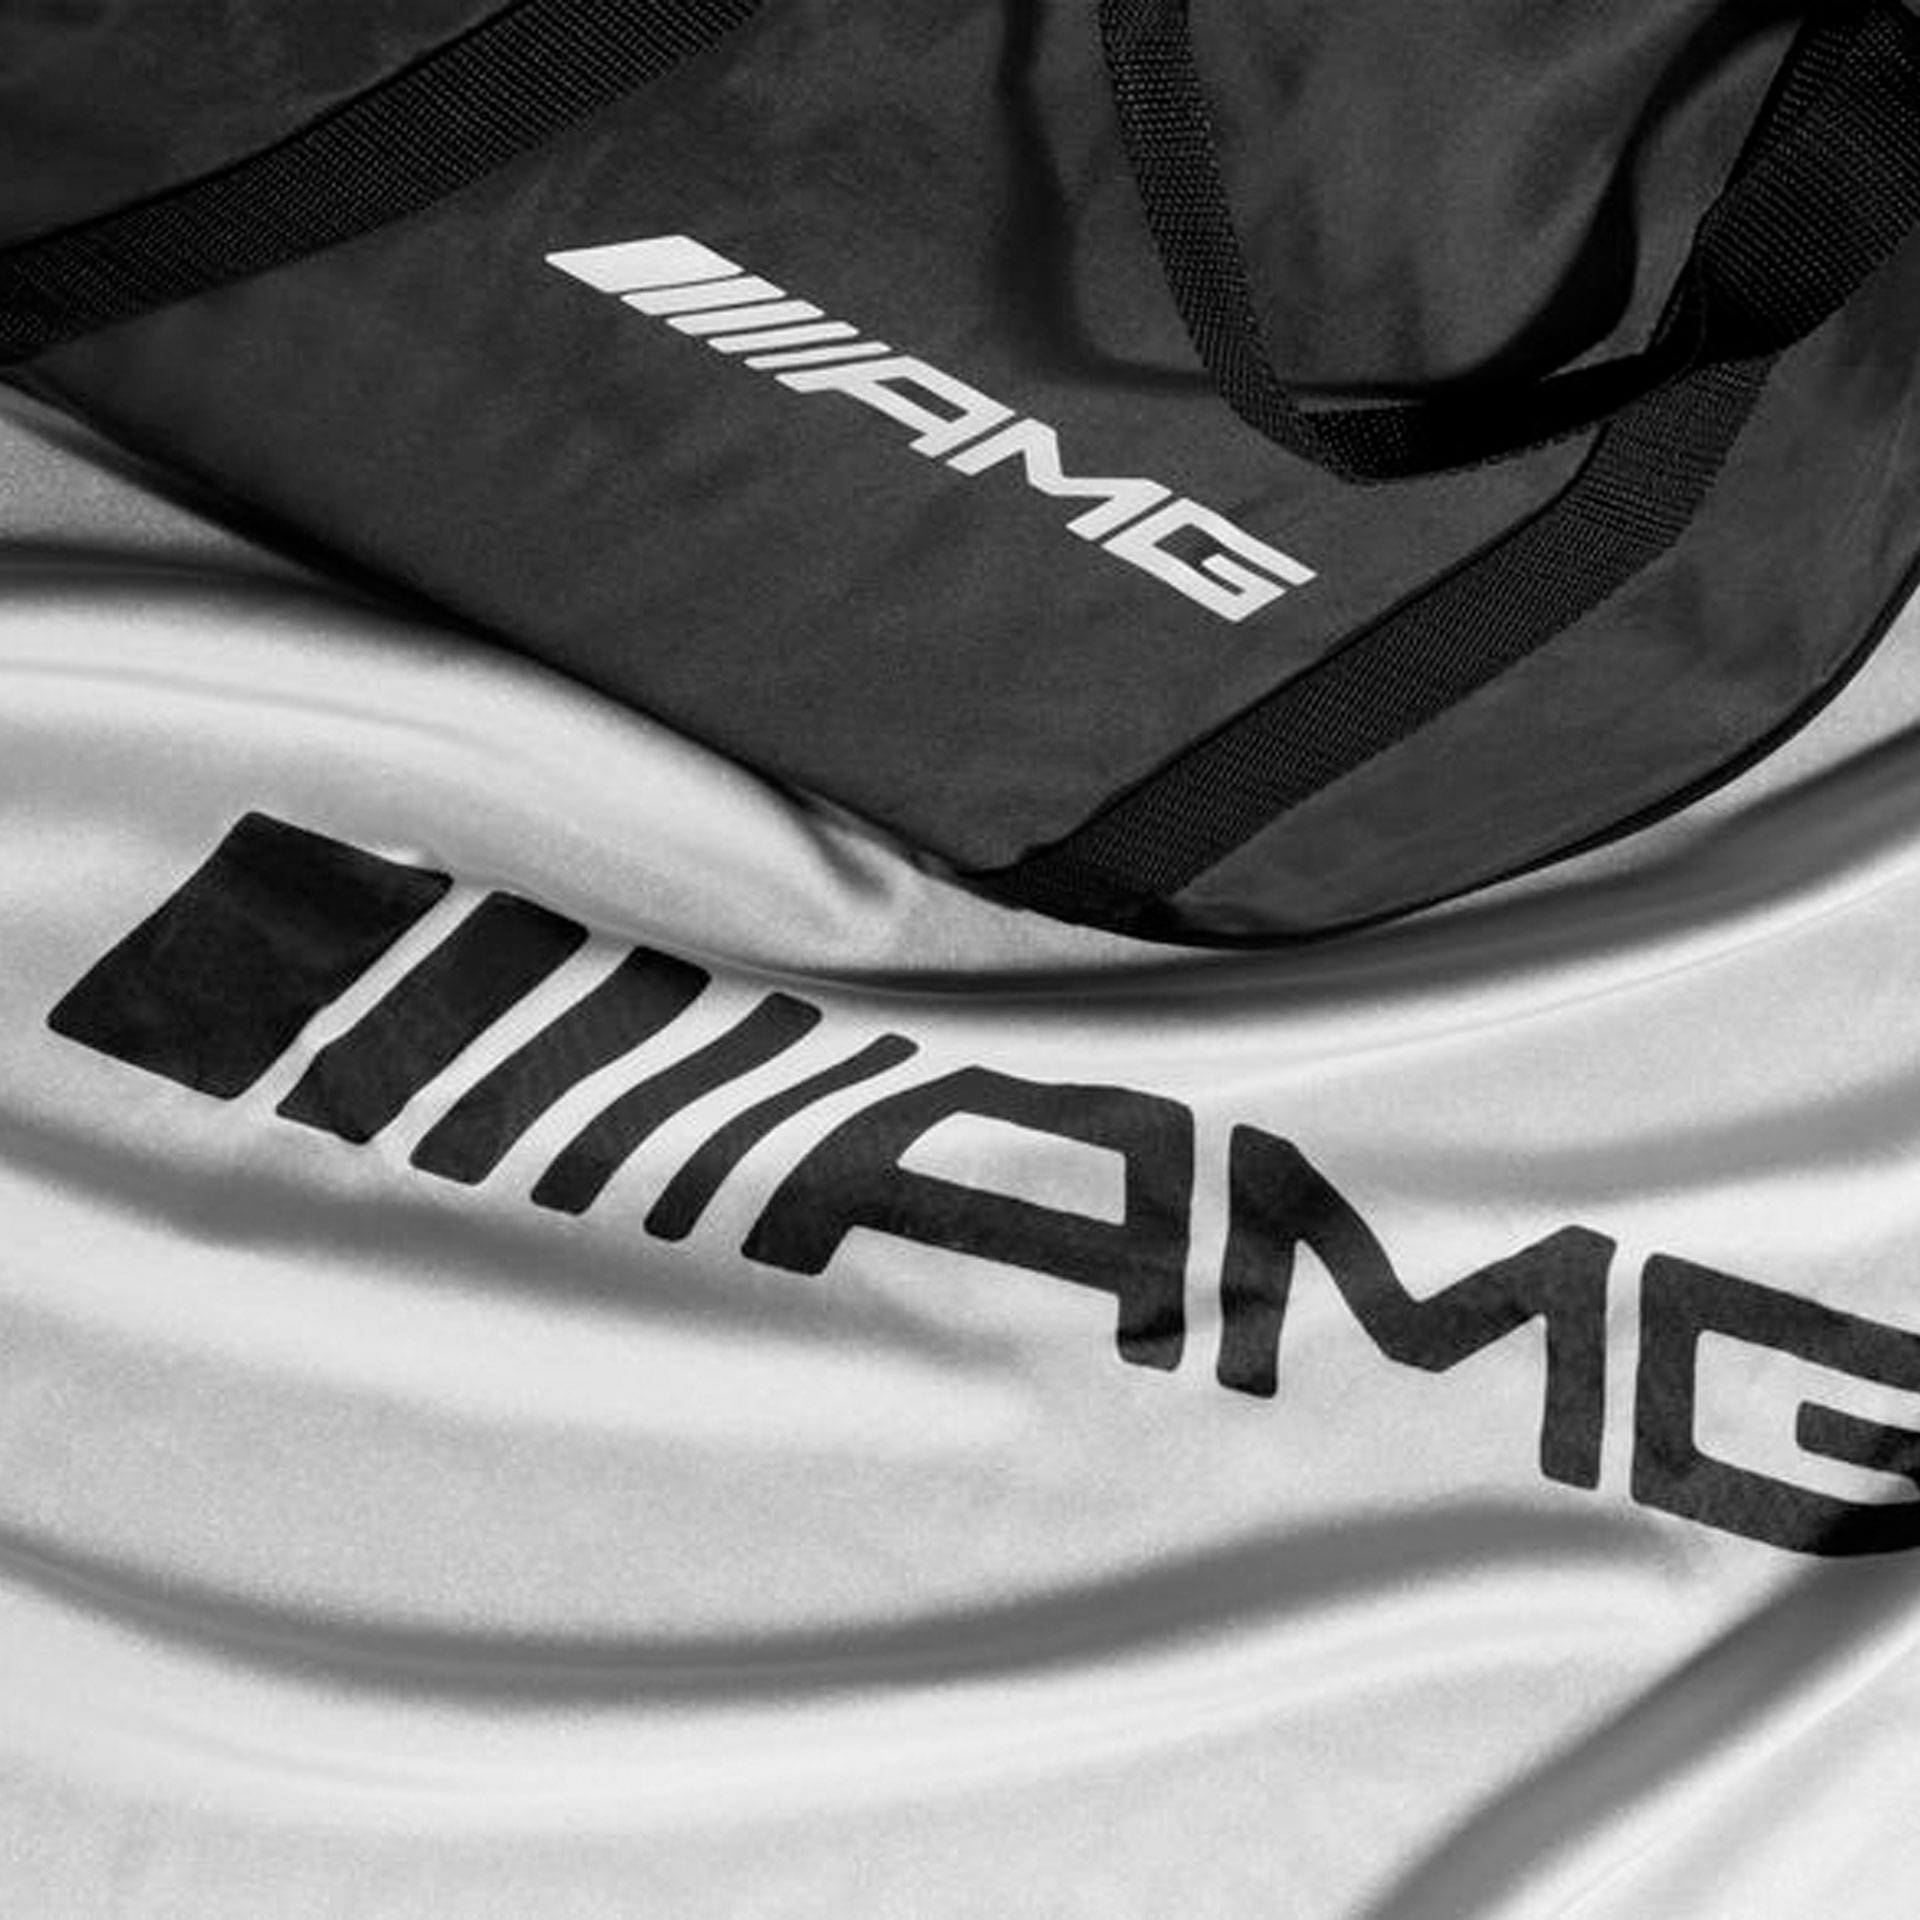 AMG Indoor-Car-Cover für GLE